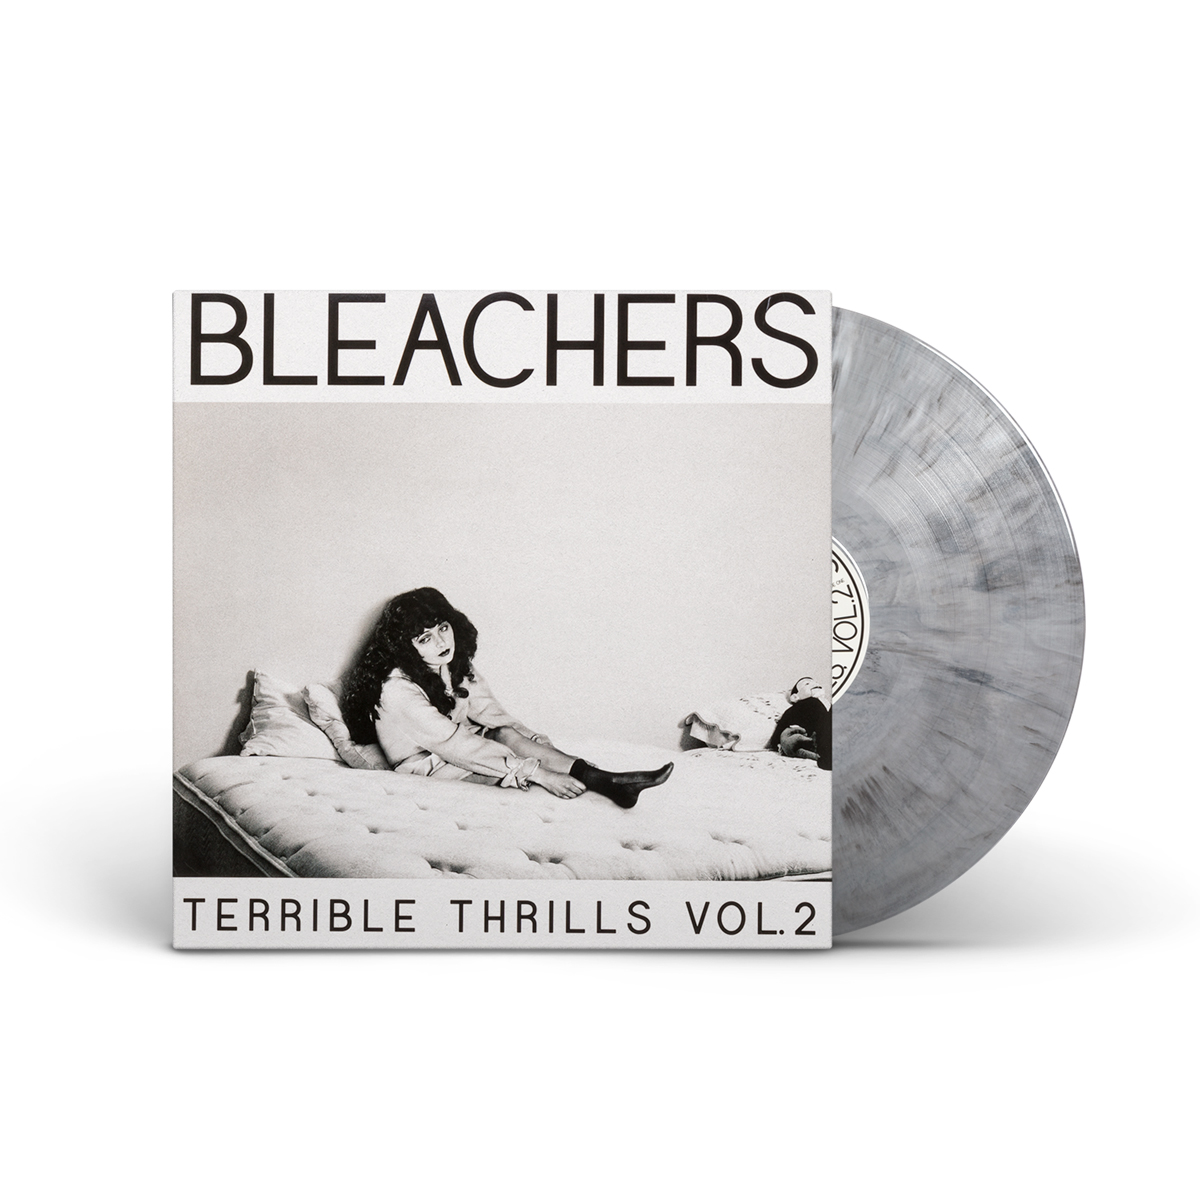 Terrible Thrills Vol. 2 LP